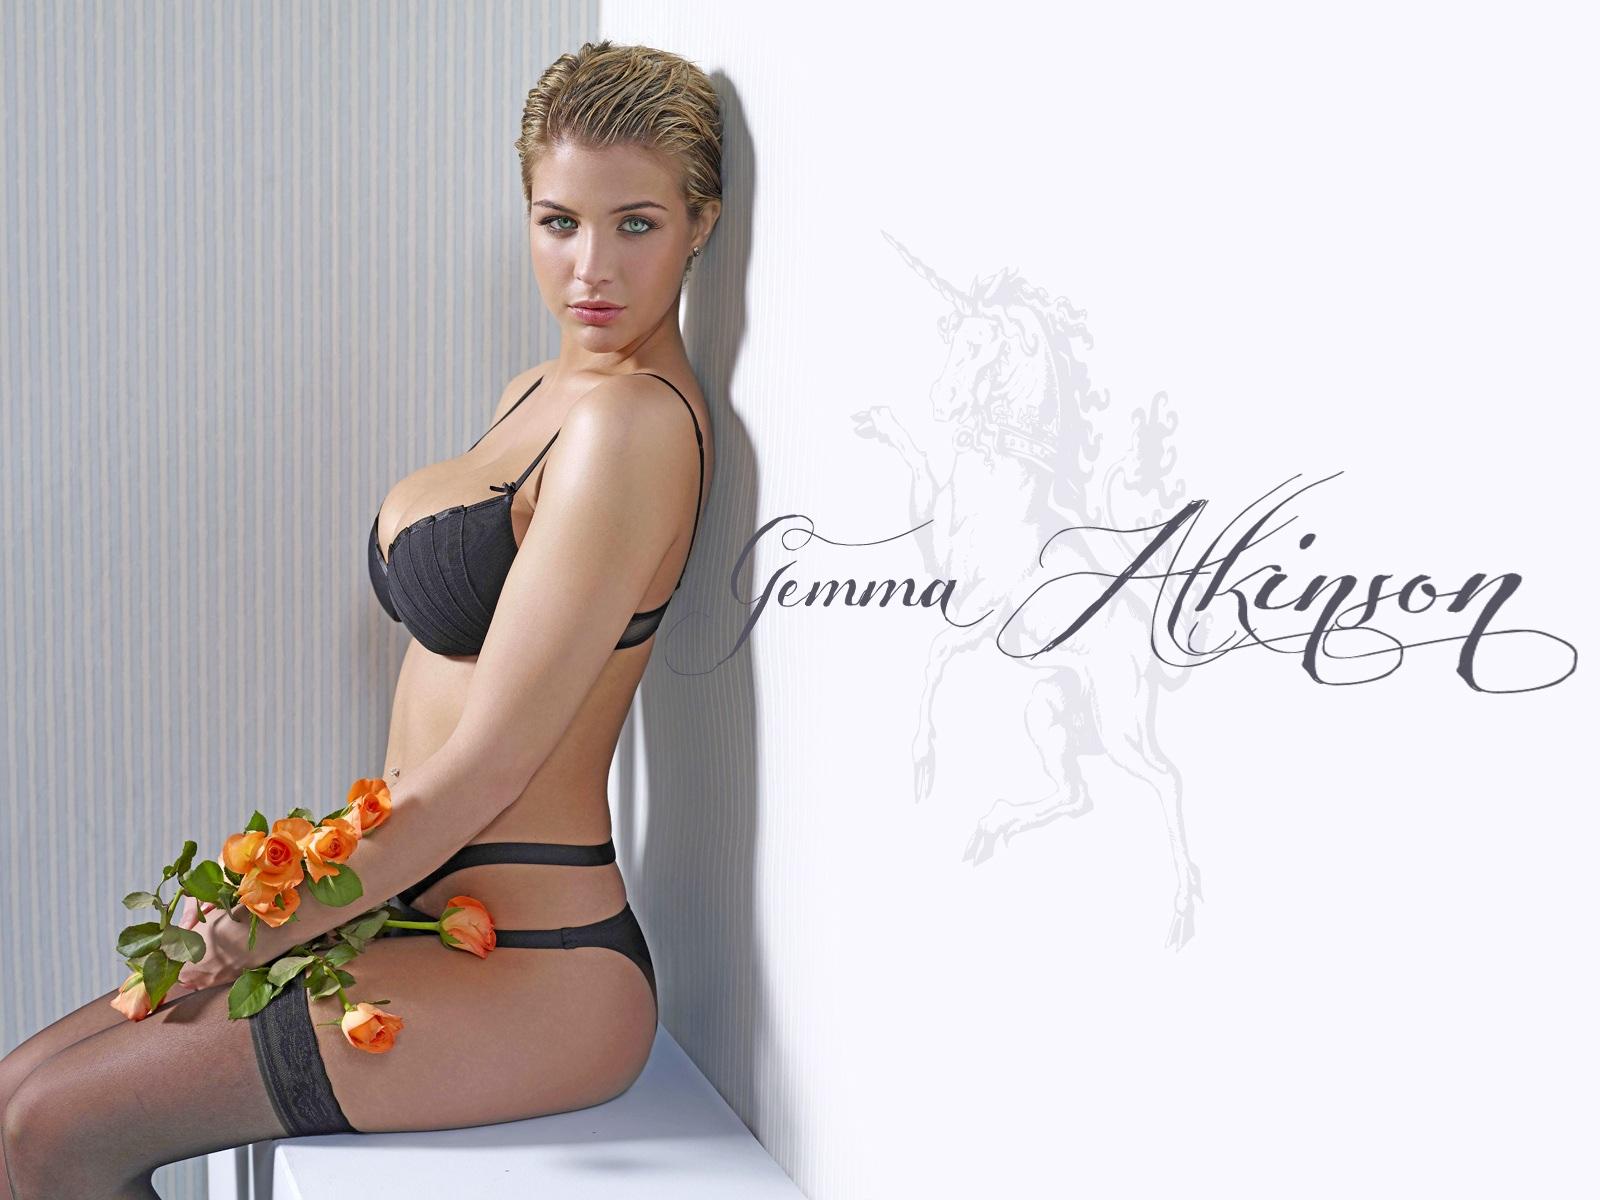 Atkinson atkinson bra image gemma british